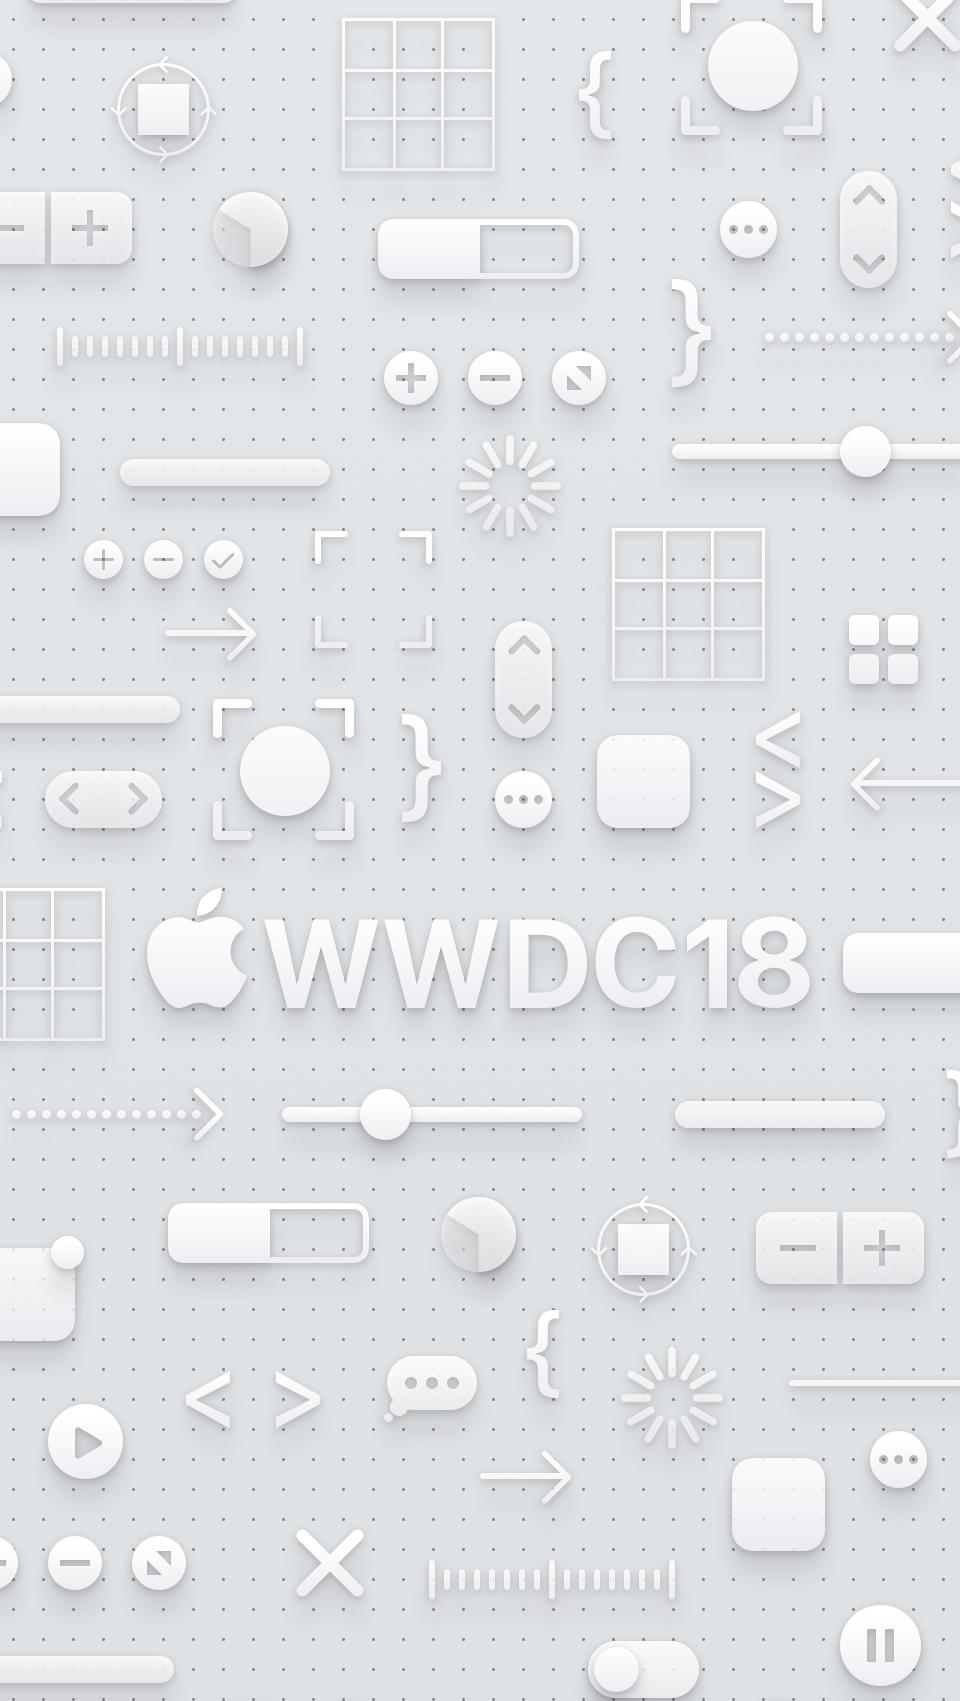 WWDC 2018 wallpaper iPhone SE light logo